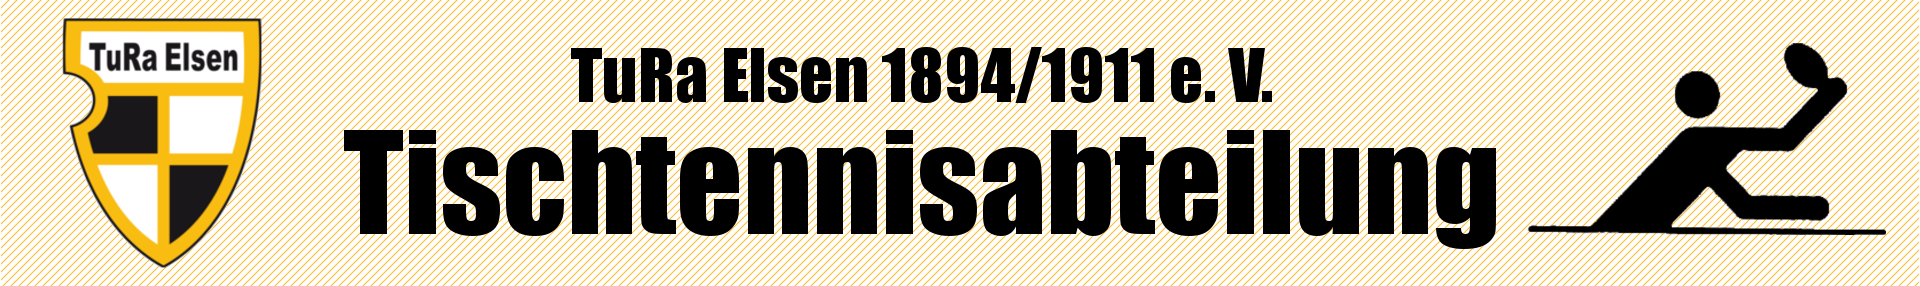 TuRa Elsen 1894/1911 e. V. - Tischtennisabteilung